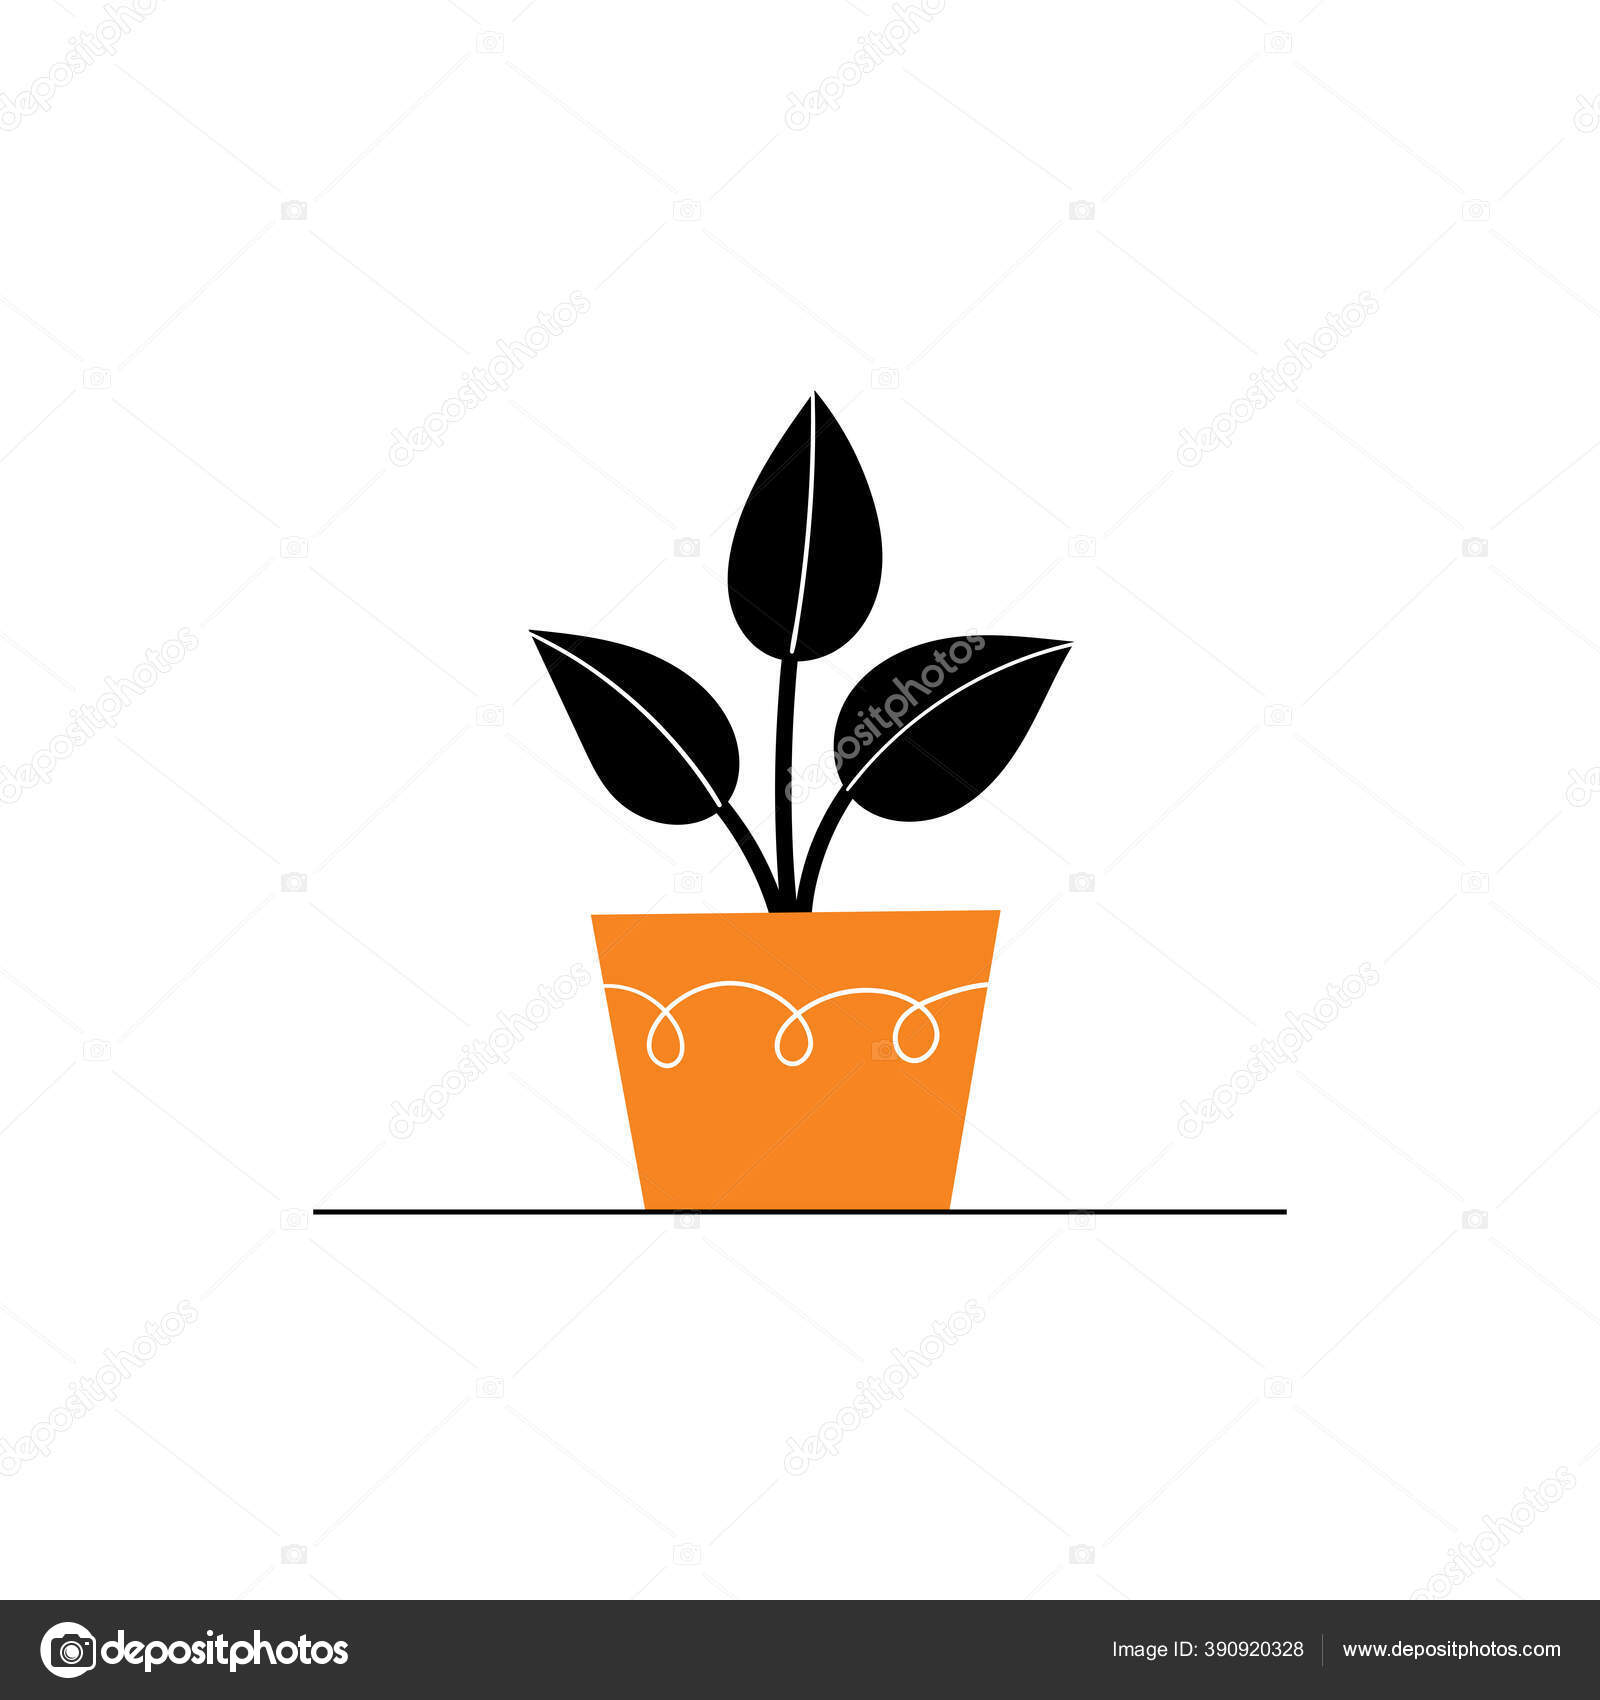 Vektor Indoor Tanaman Bunga Kentang Tanaman Rumahan Bergaya Dekorasi Rumah Dan Interior Succulents Monstera Cacti Ilustrasi Diisolasi Pada Latar Belakang Putih Stok Vektor C Lisi Note Yandex Ru 390920328